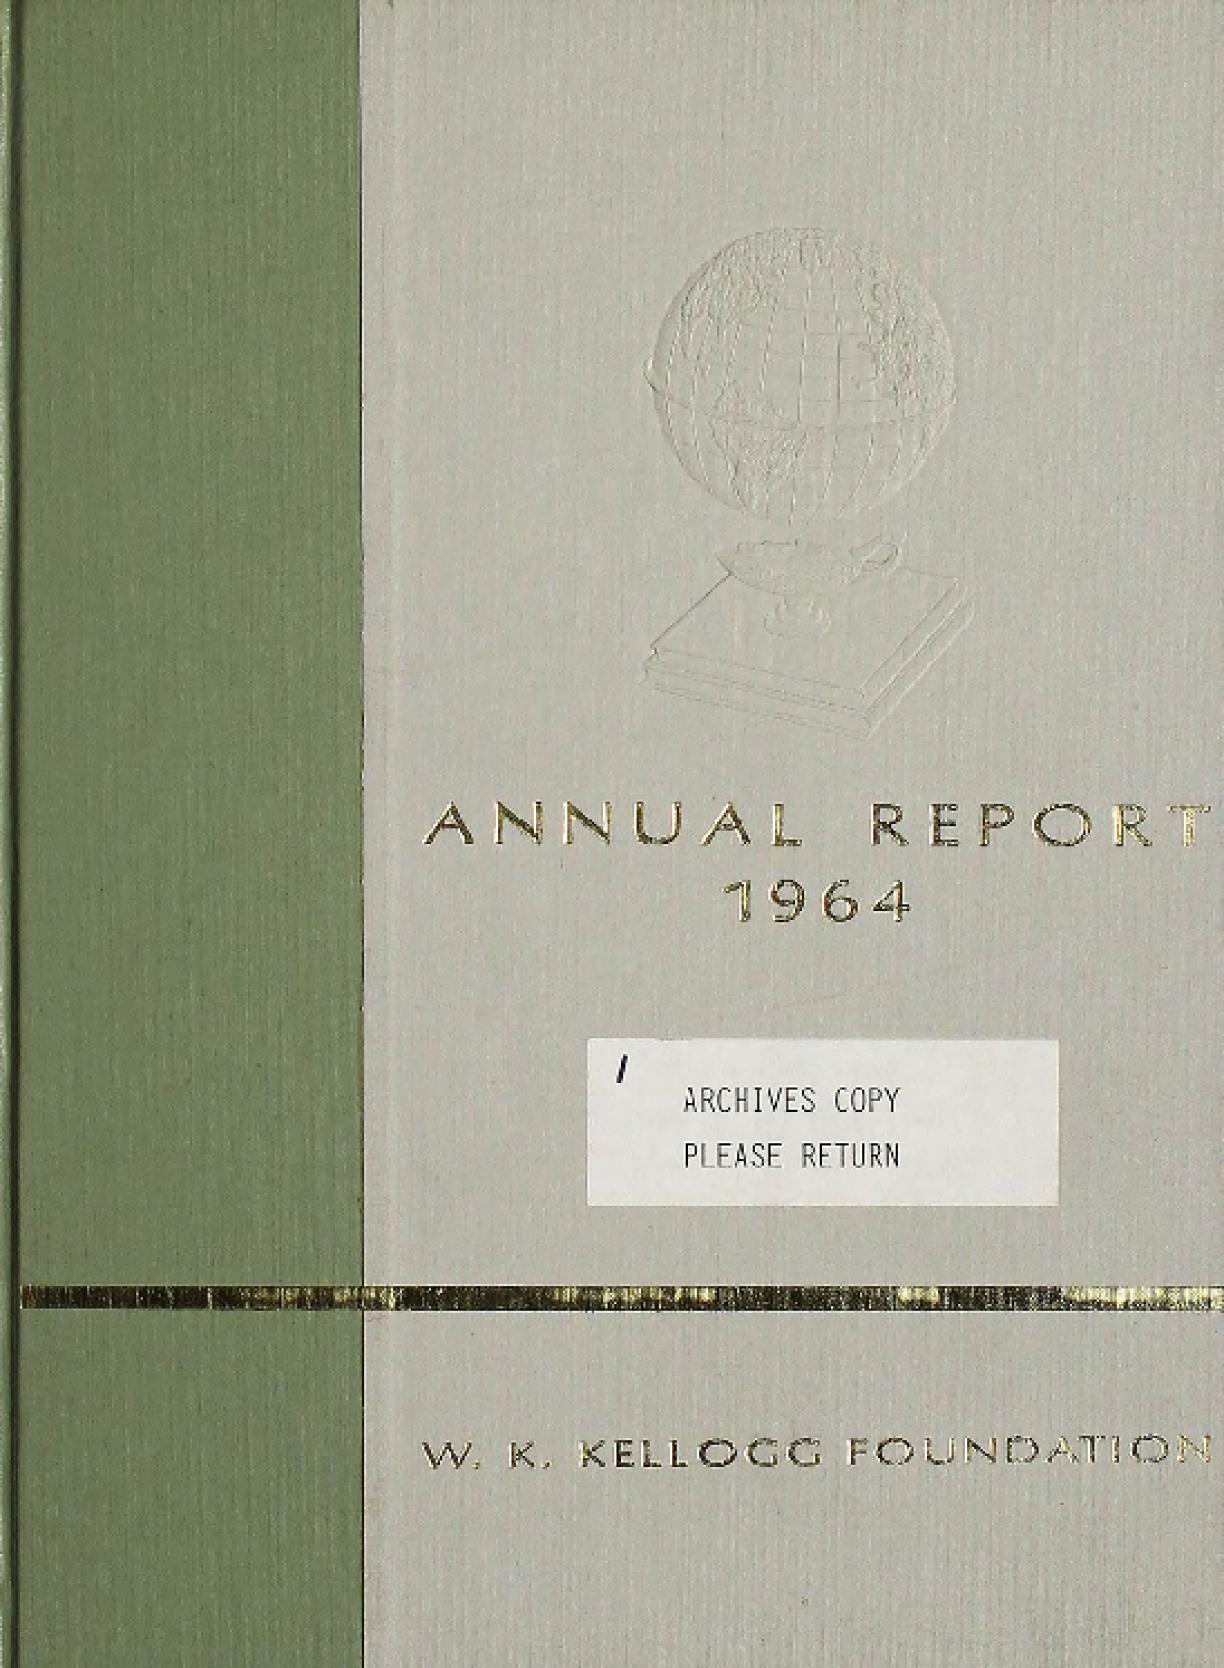 1964 W.K. Kellogg Foundation Annual Report